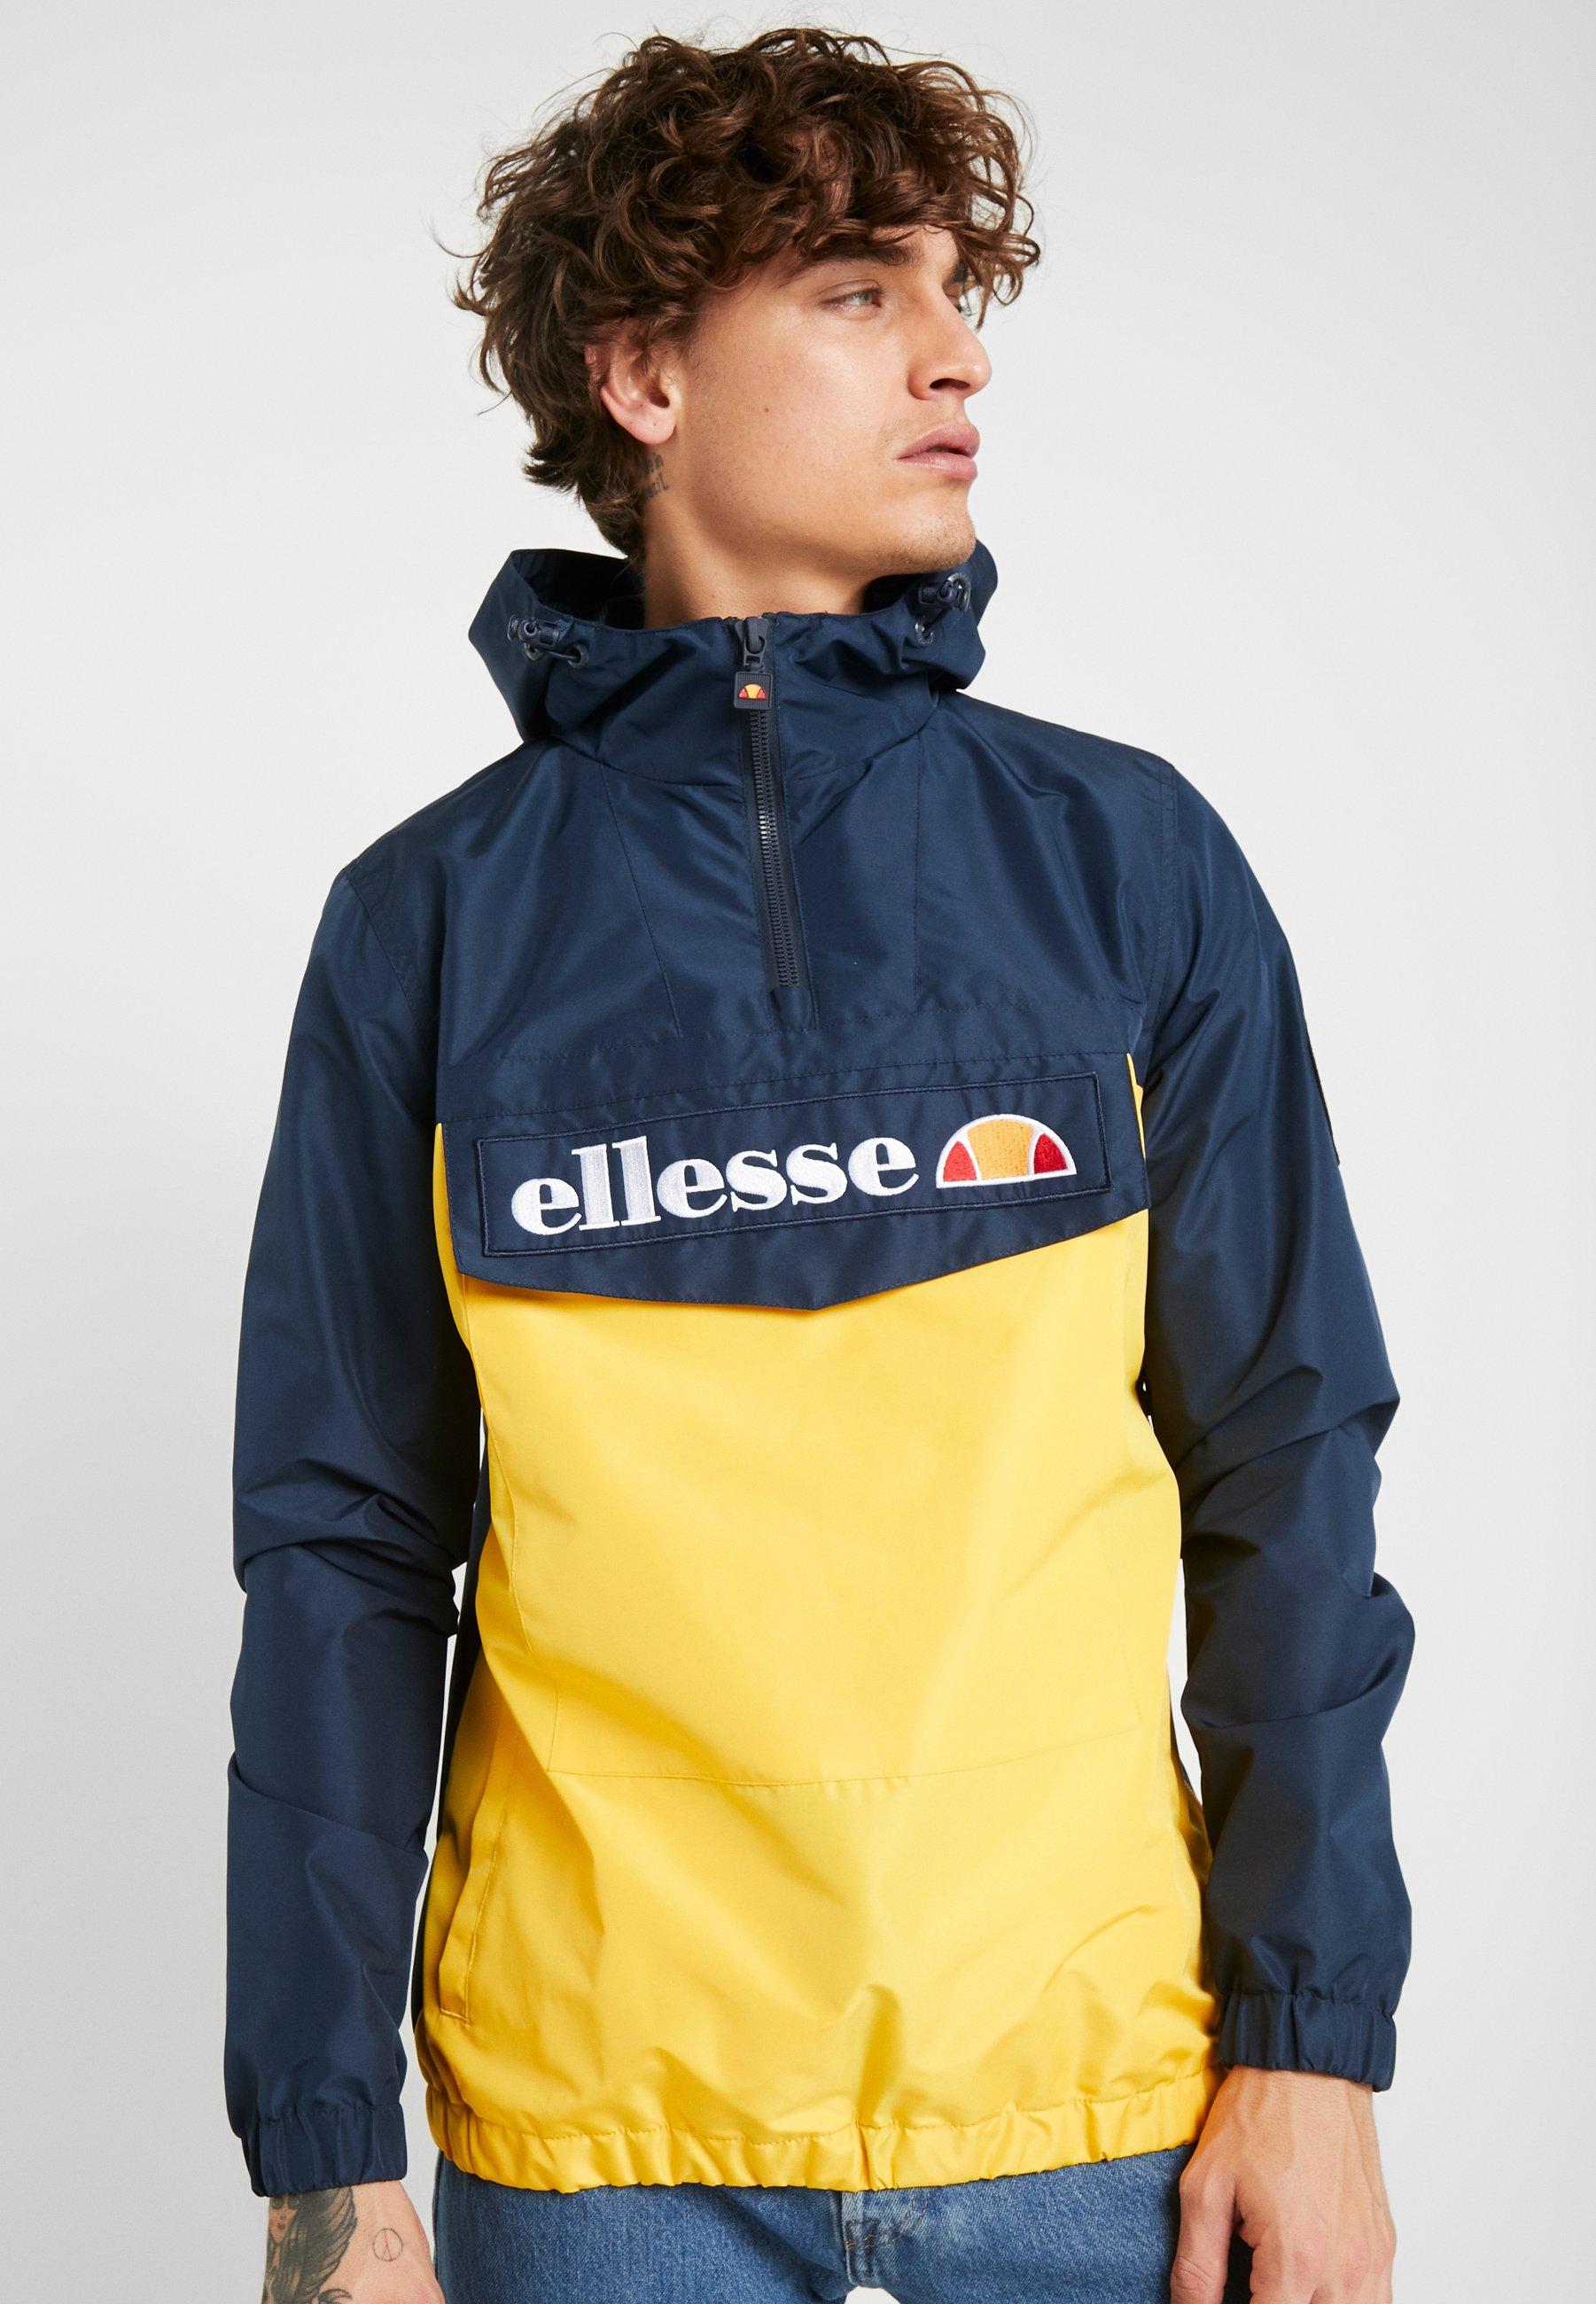 Ellesse Wiatrówka - yellow/navy